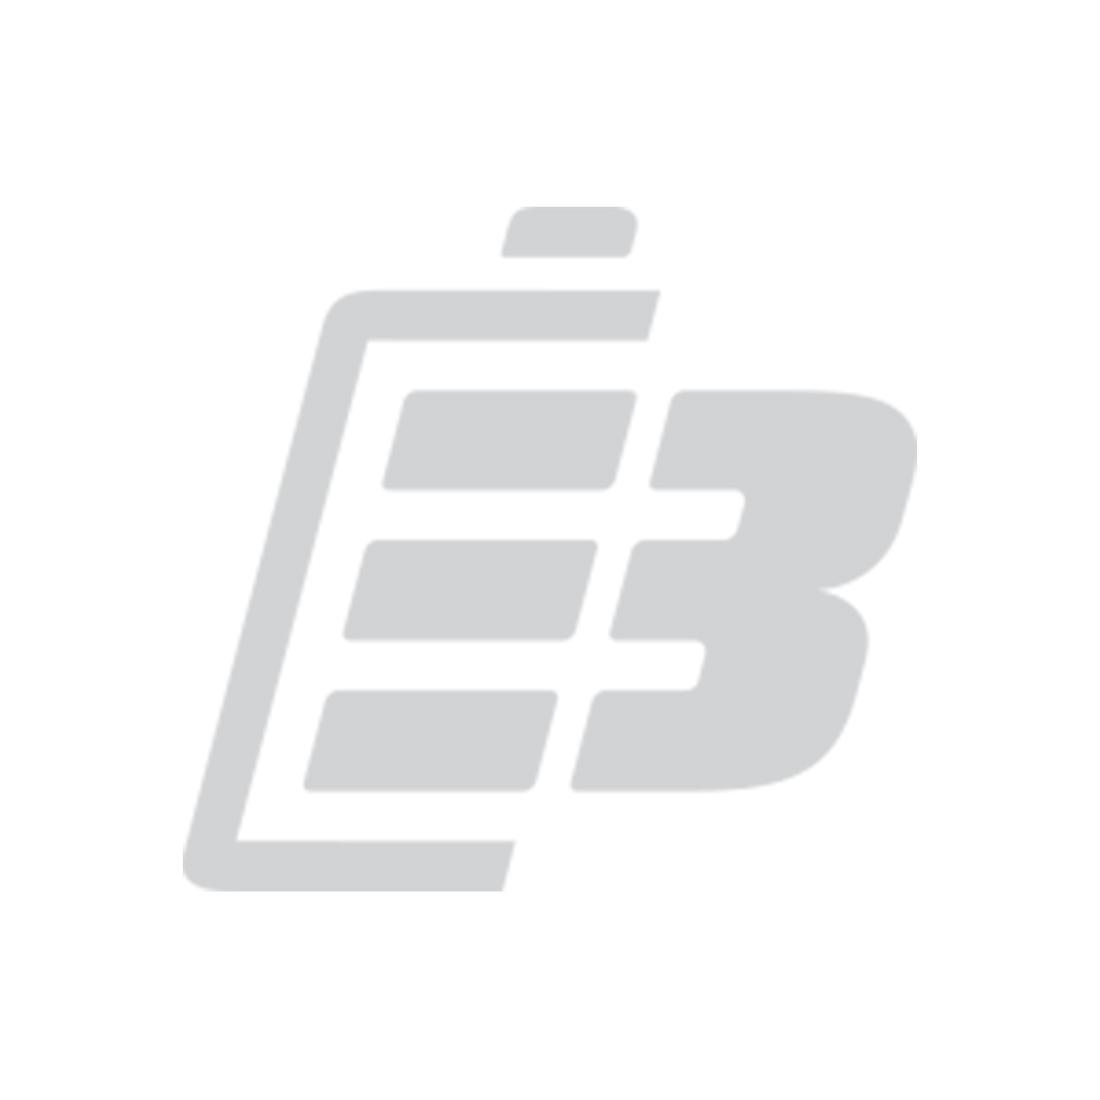 Mobile phone battery LG KU250_1